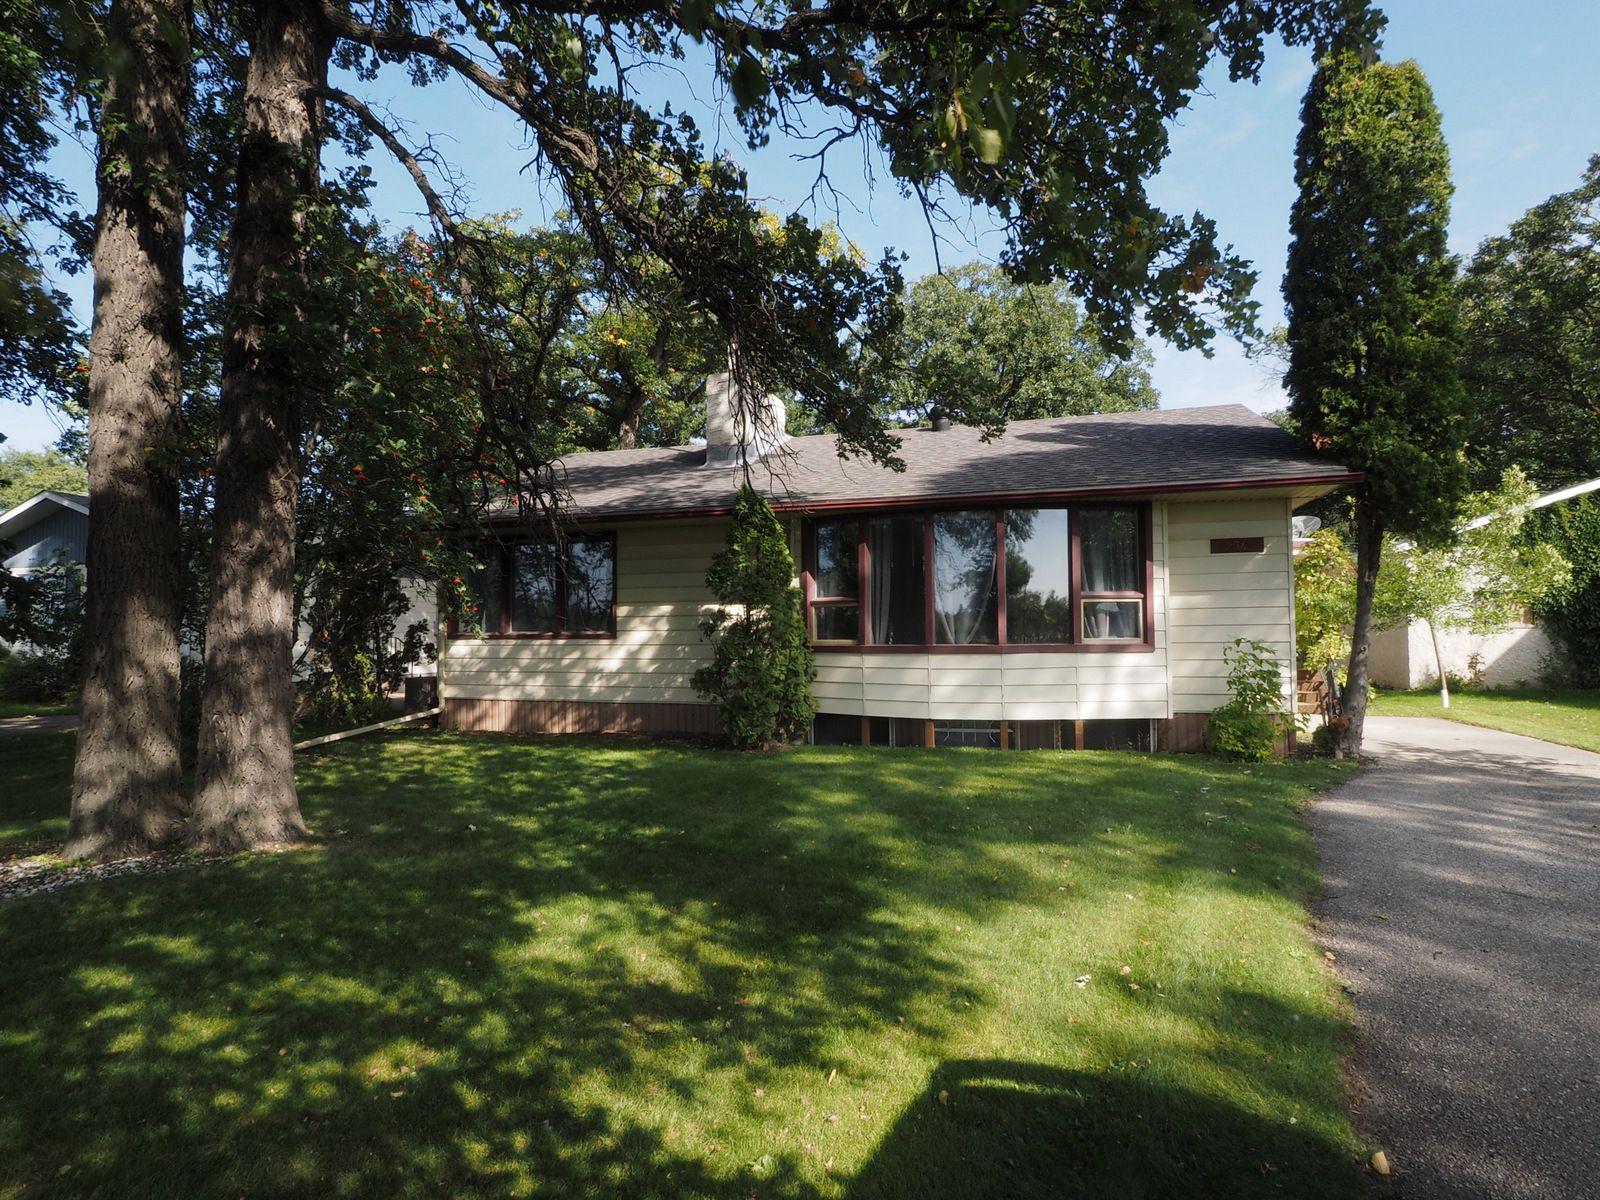 Main Photo: 234 Crescent Road W in Portage la Prairie: House for sale : MLS®# 202102253